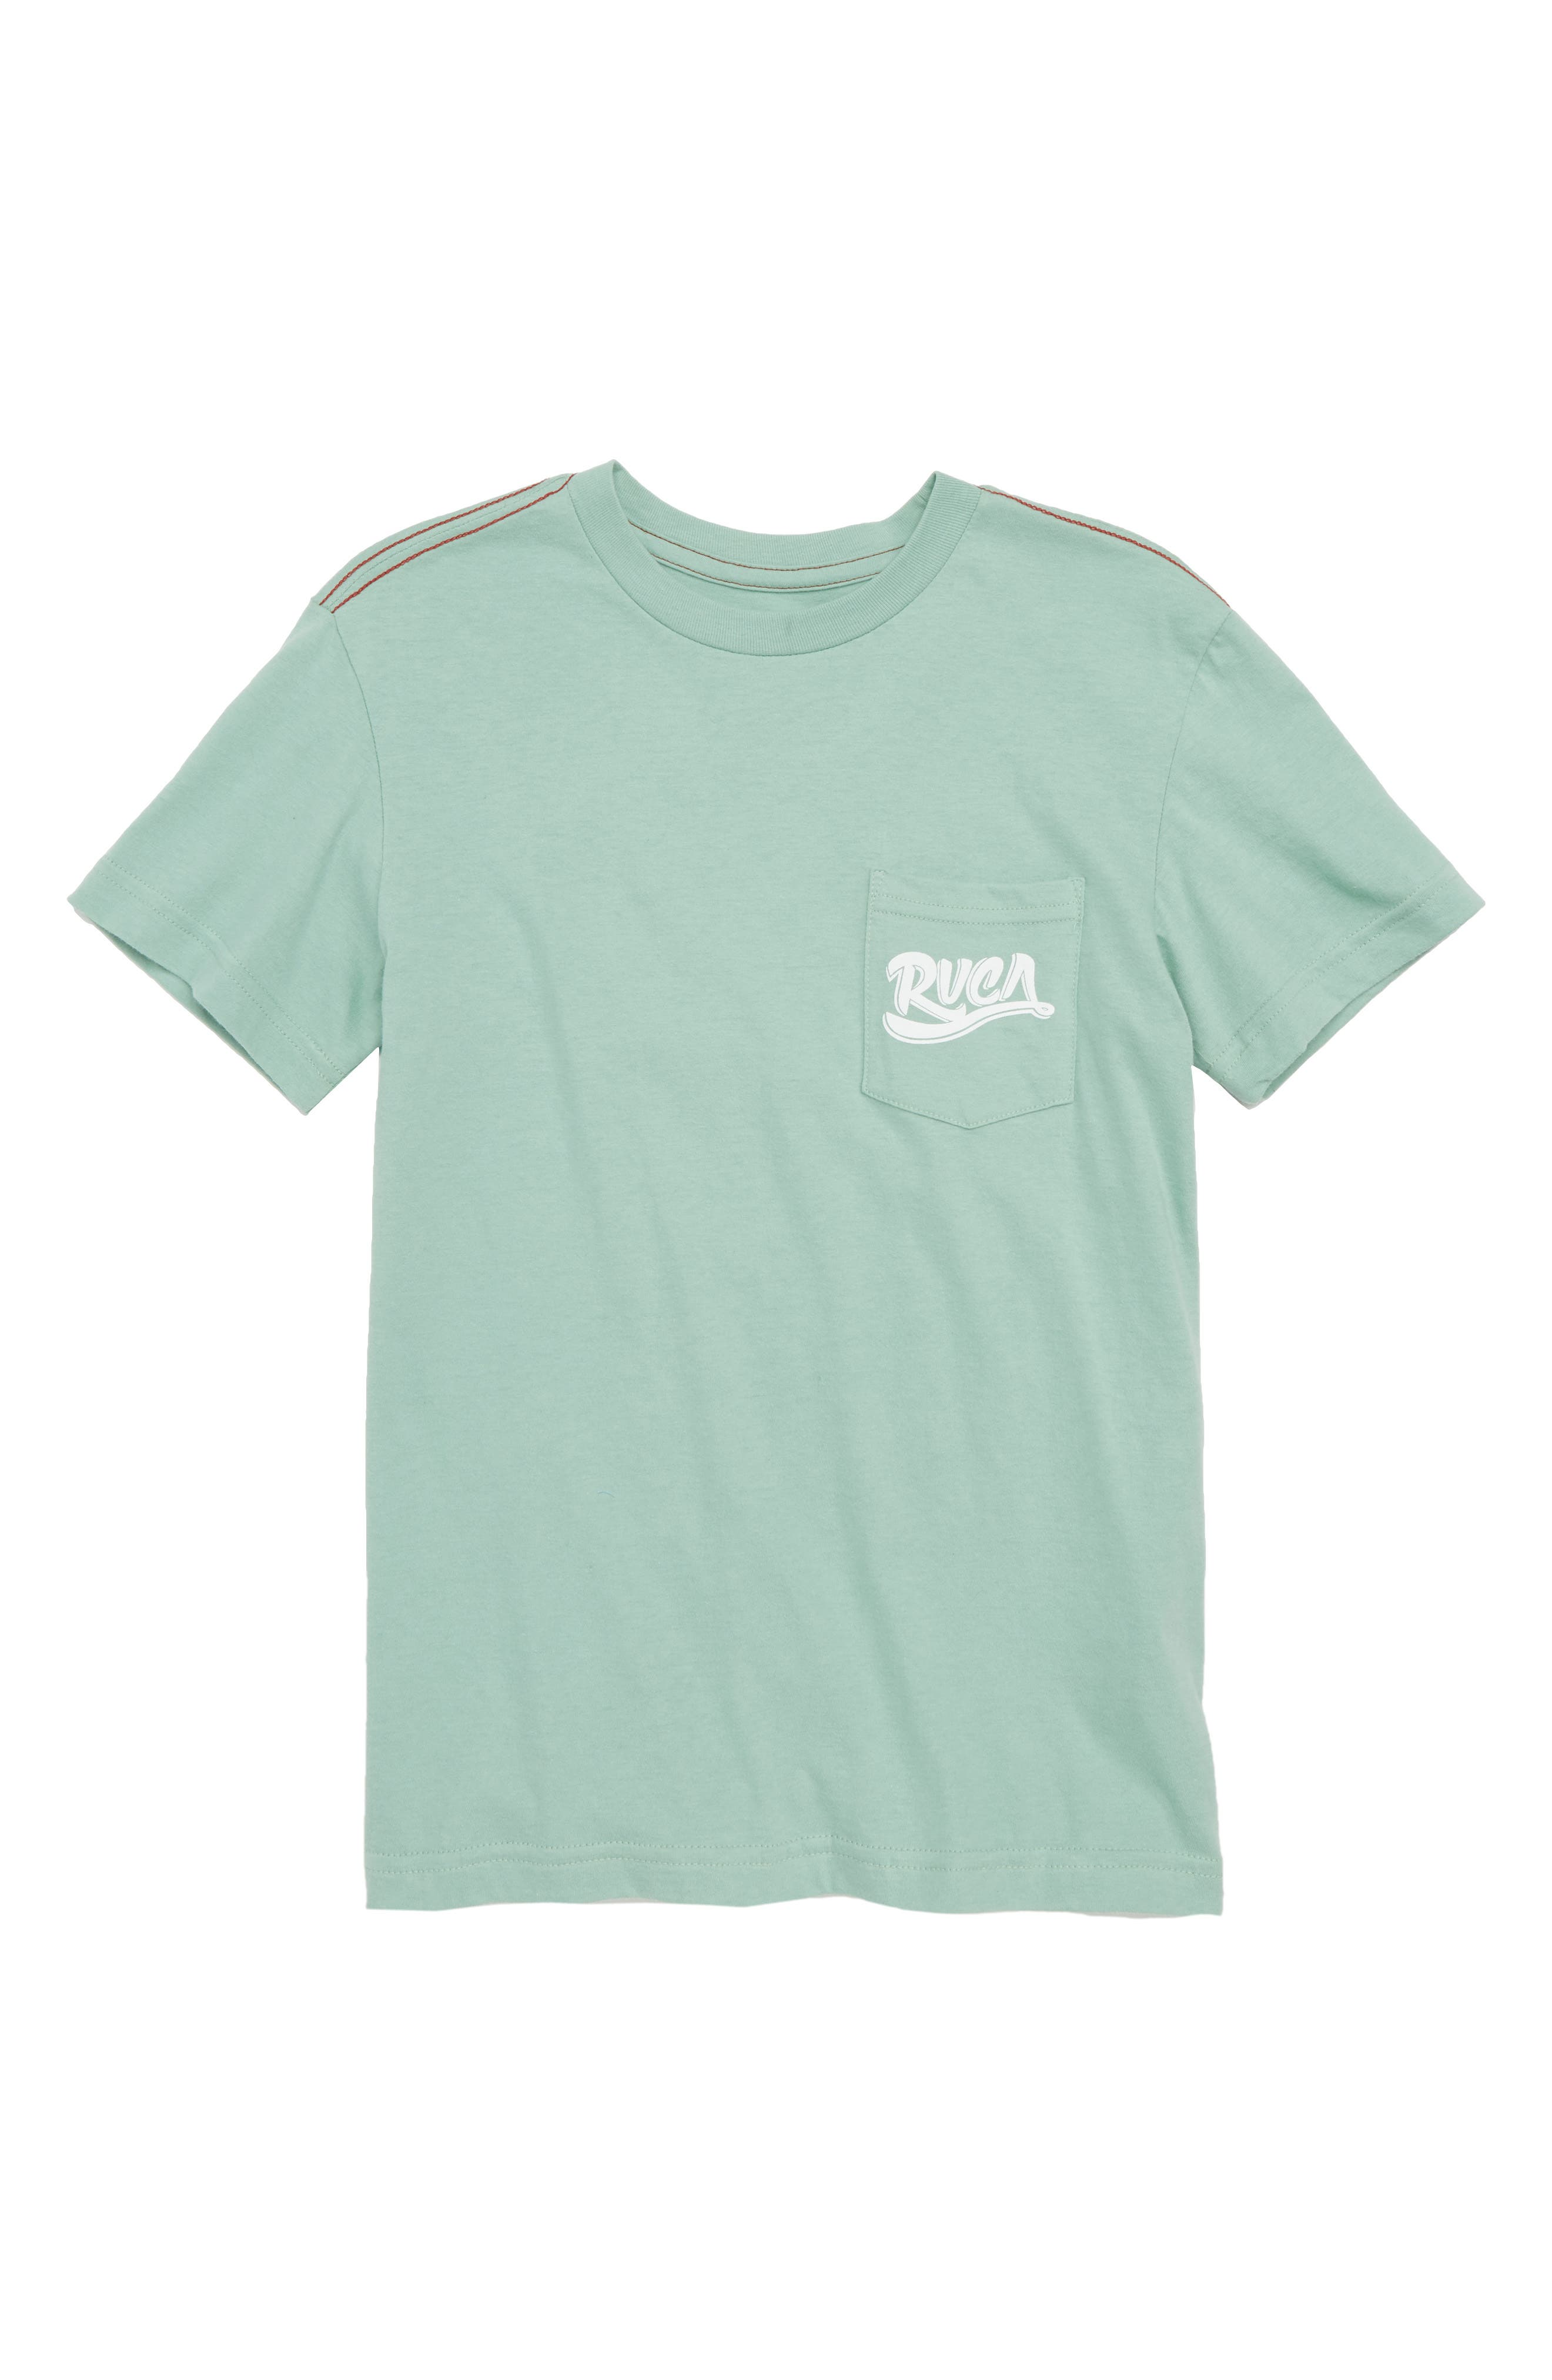 Score Board Graphic T-Shirt,                         Main,                         color, 320